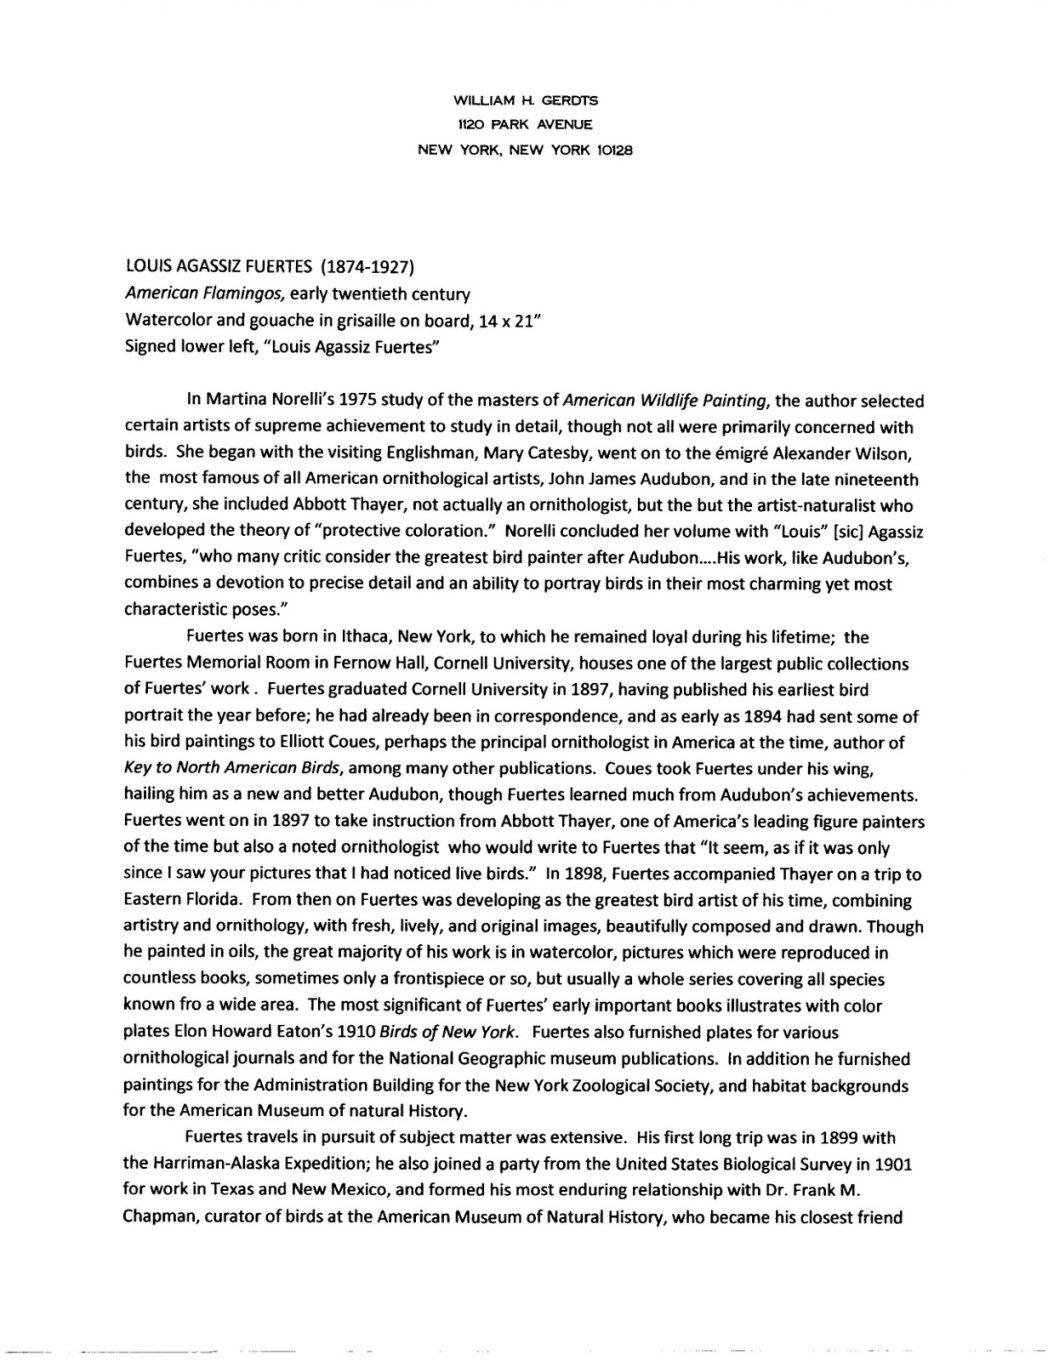 015 Research Proposal Essay Topics Questions Paper Example